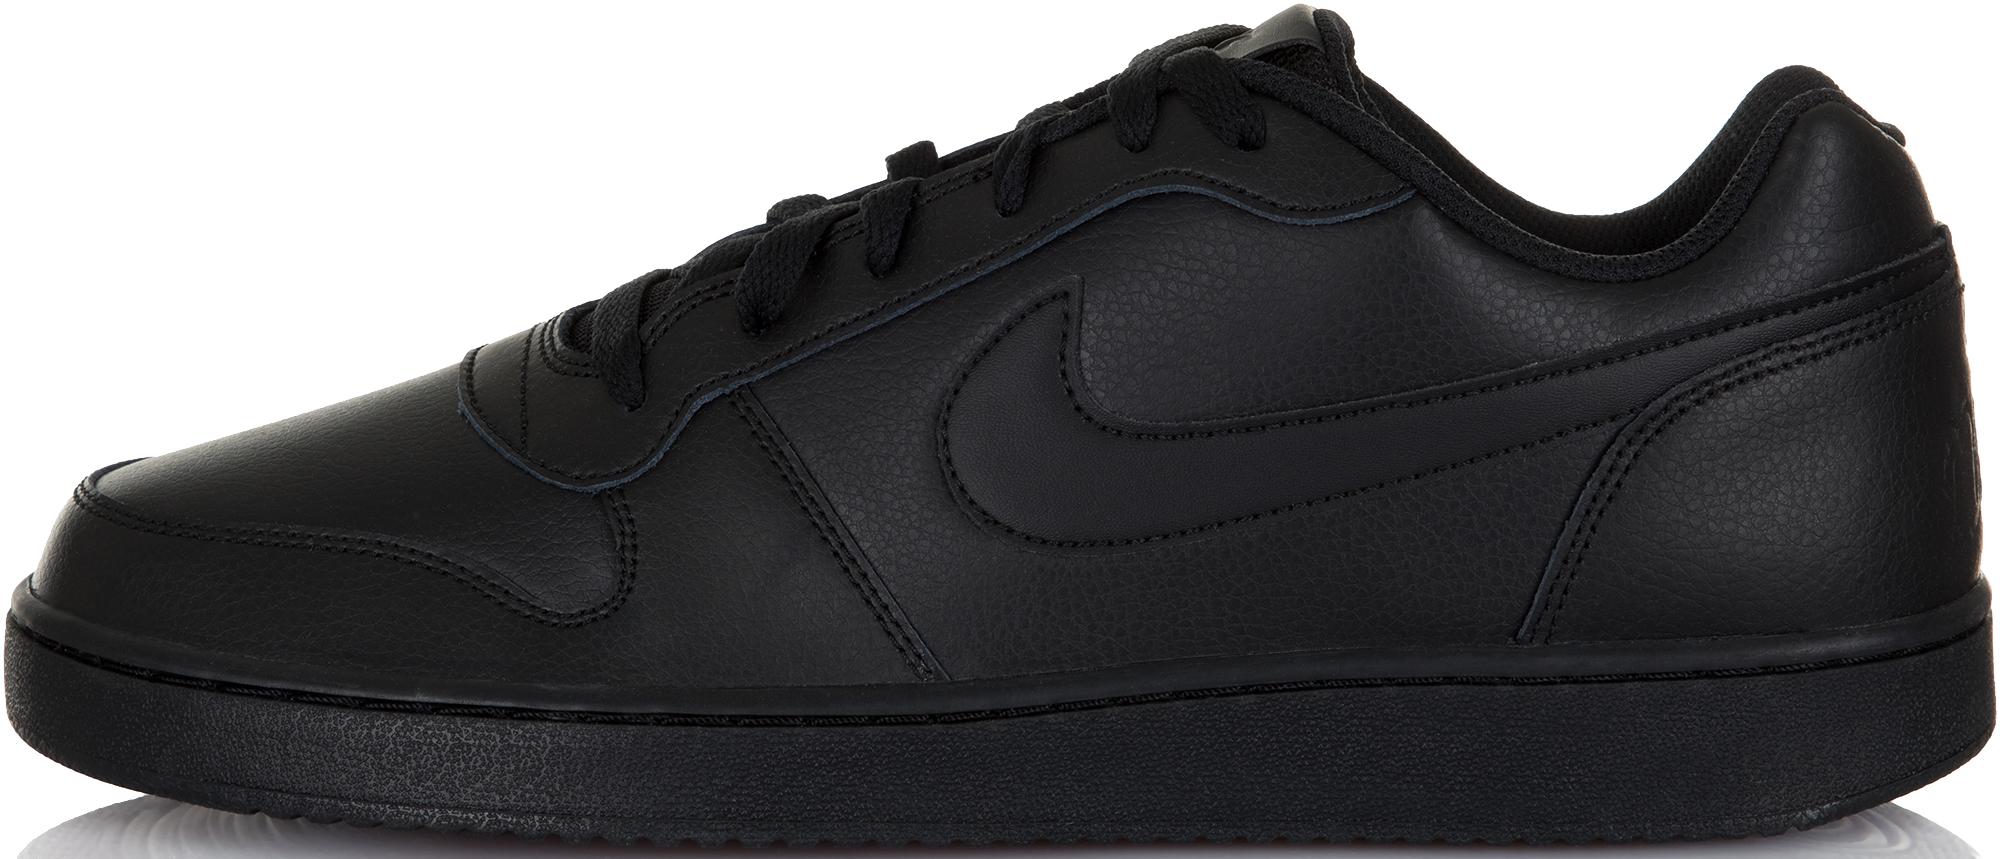 Nike Кеды мужские Nike Ebernon Low, размер 46,5 цена